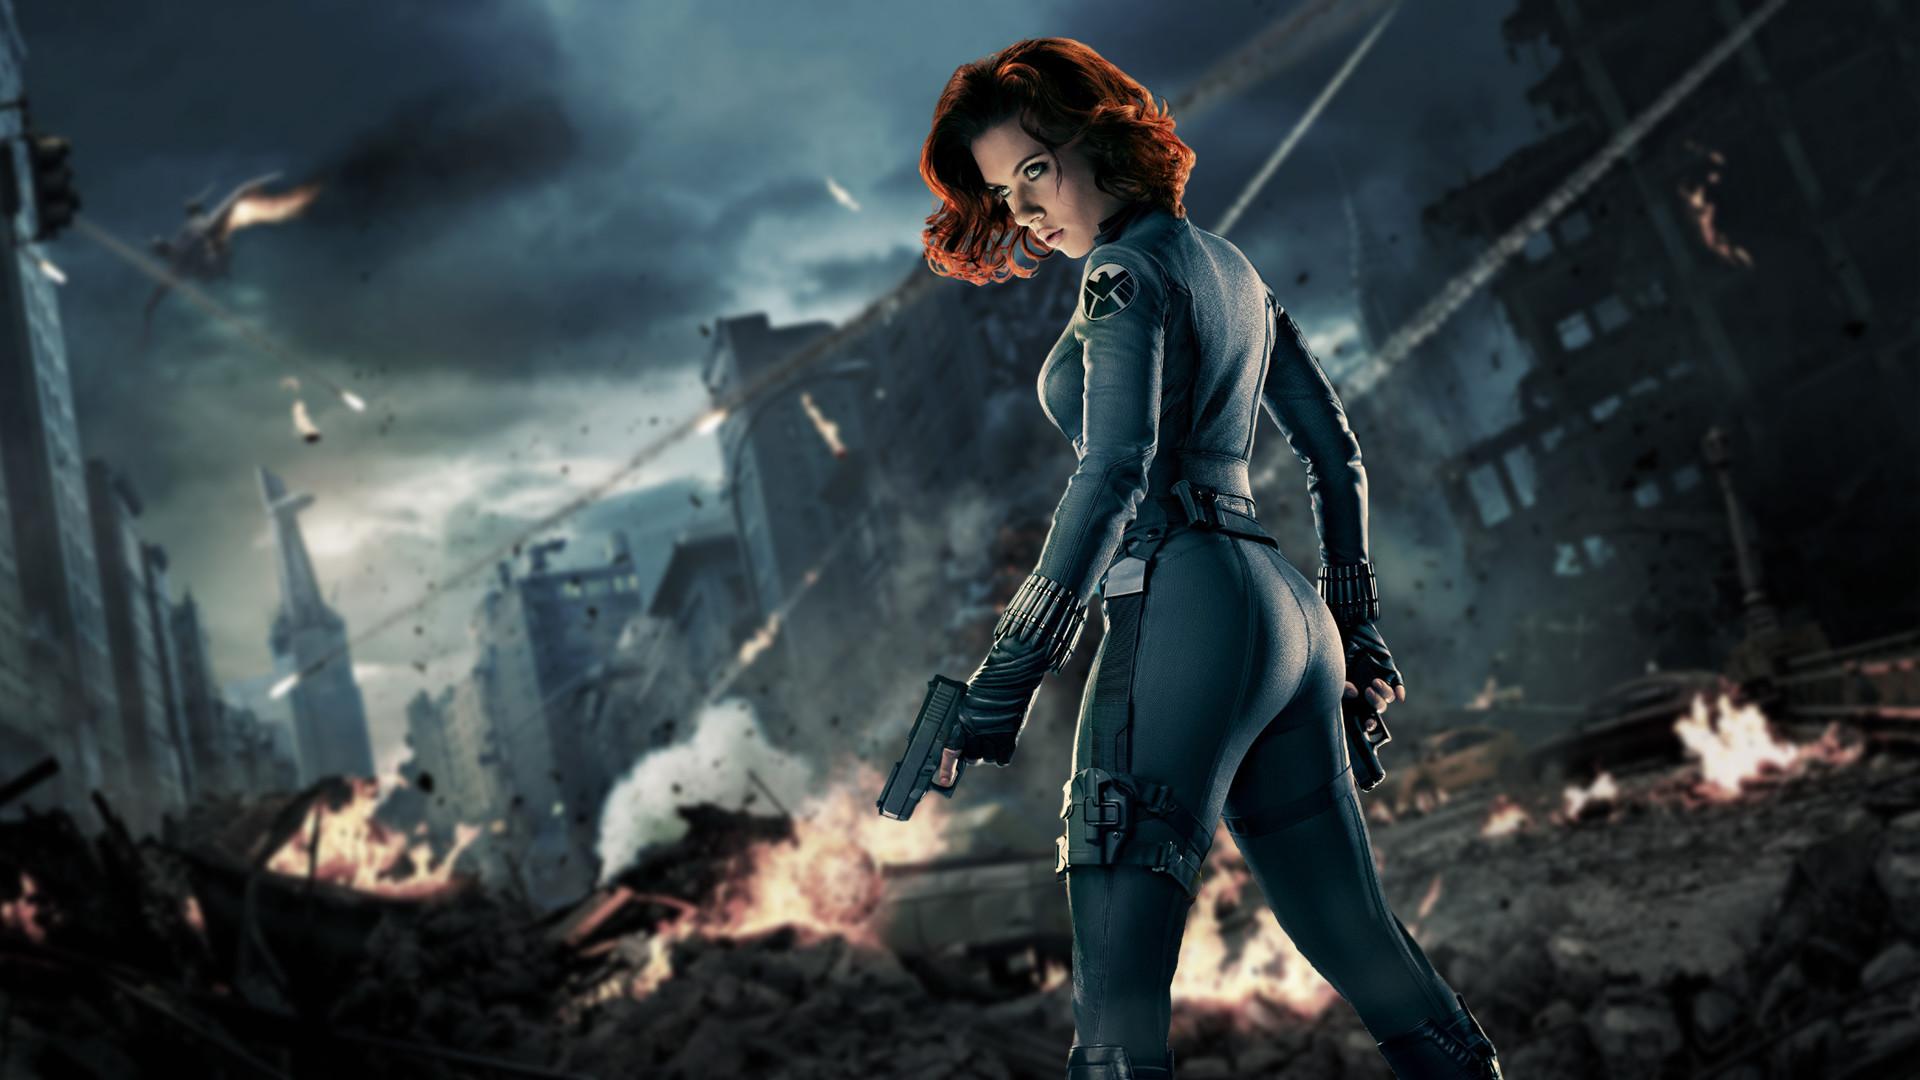 Scarlett Johansson Black Widow Wallpaper 76 Images